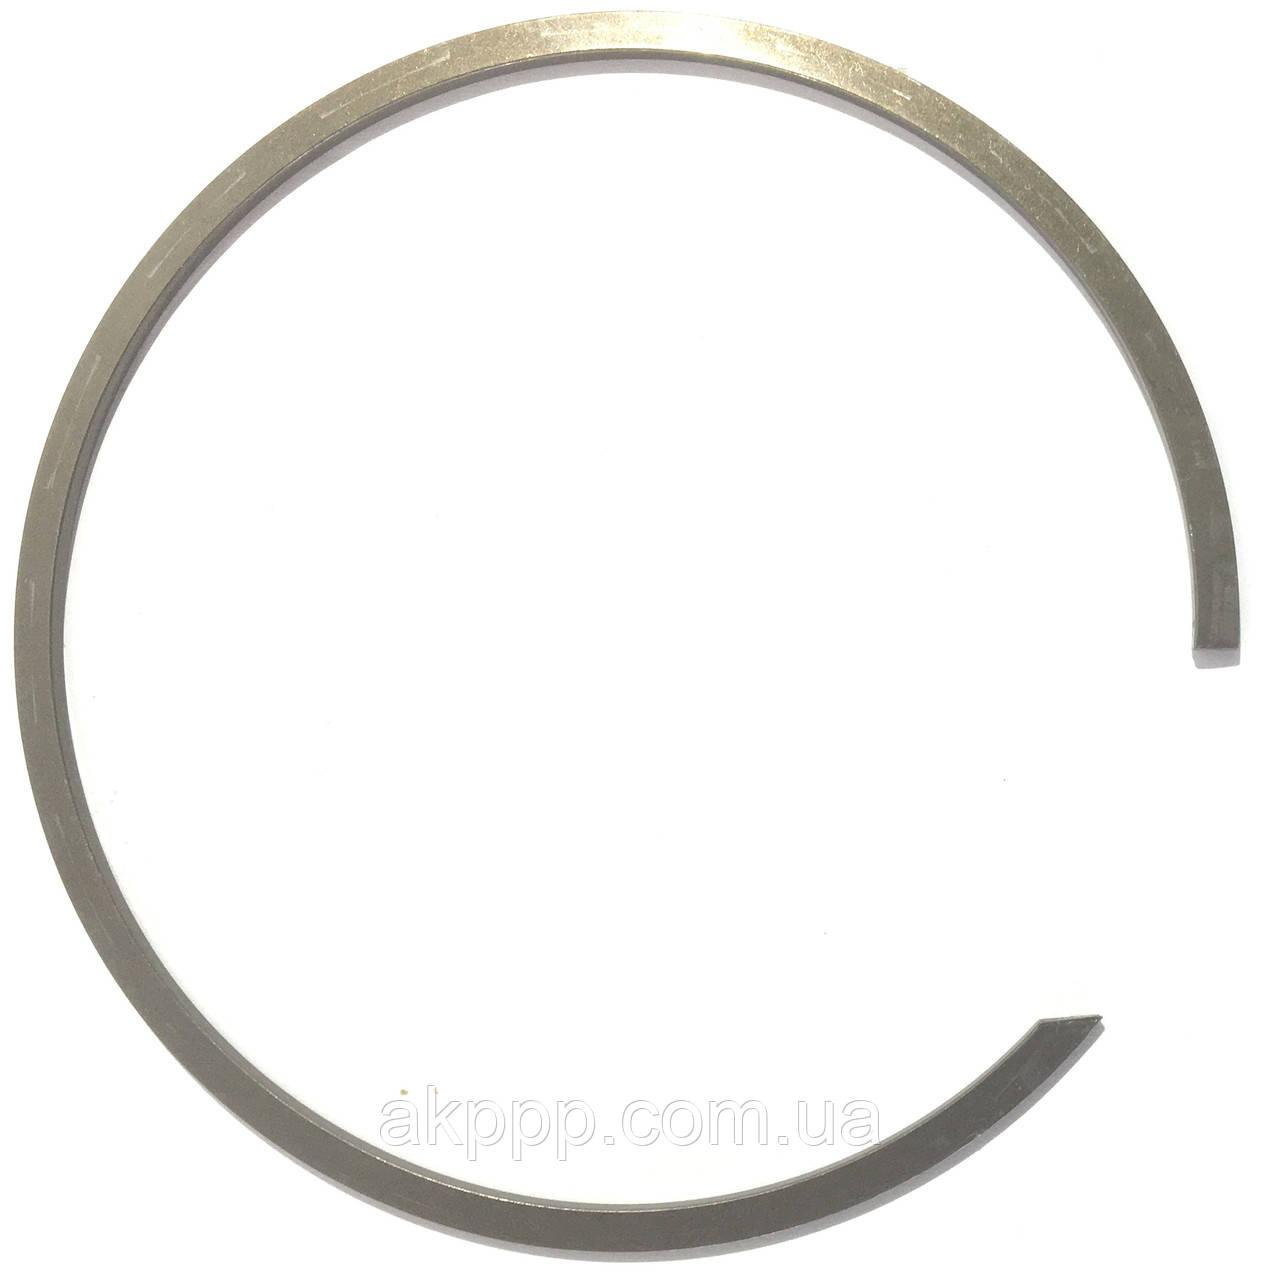 Стопорное кольцо акпп 6T40E/6T45E входящей планетарки, снято с новой коробки